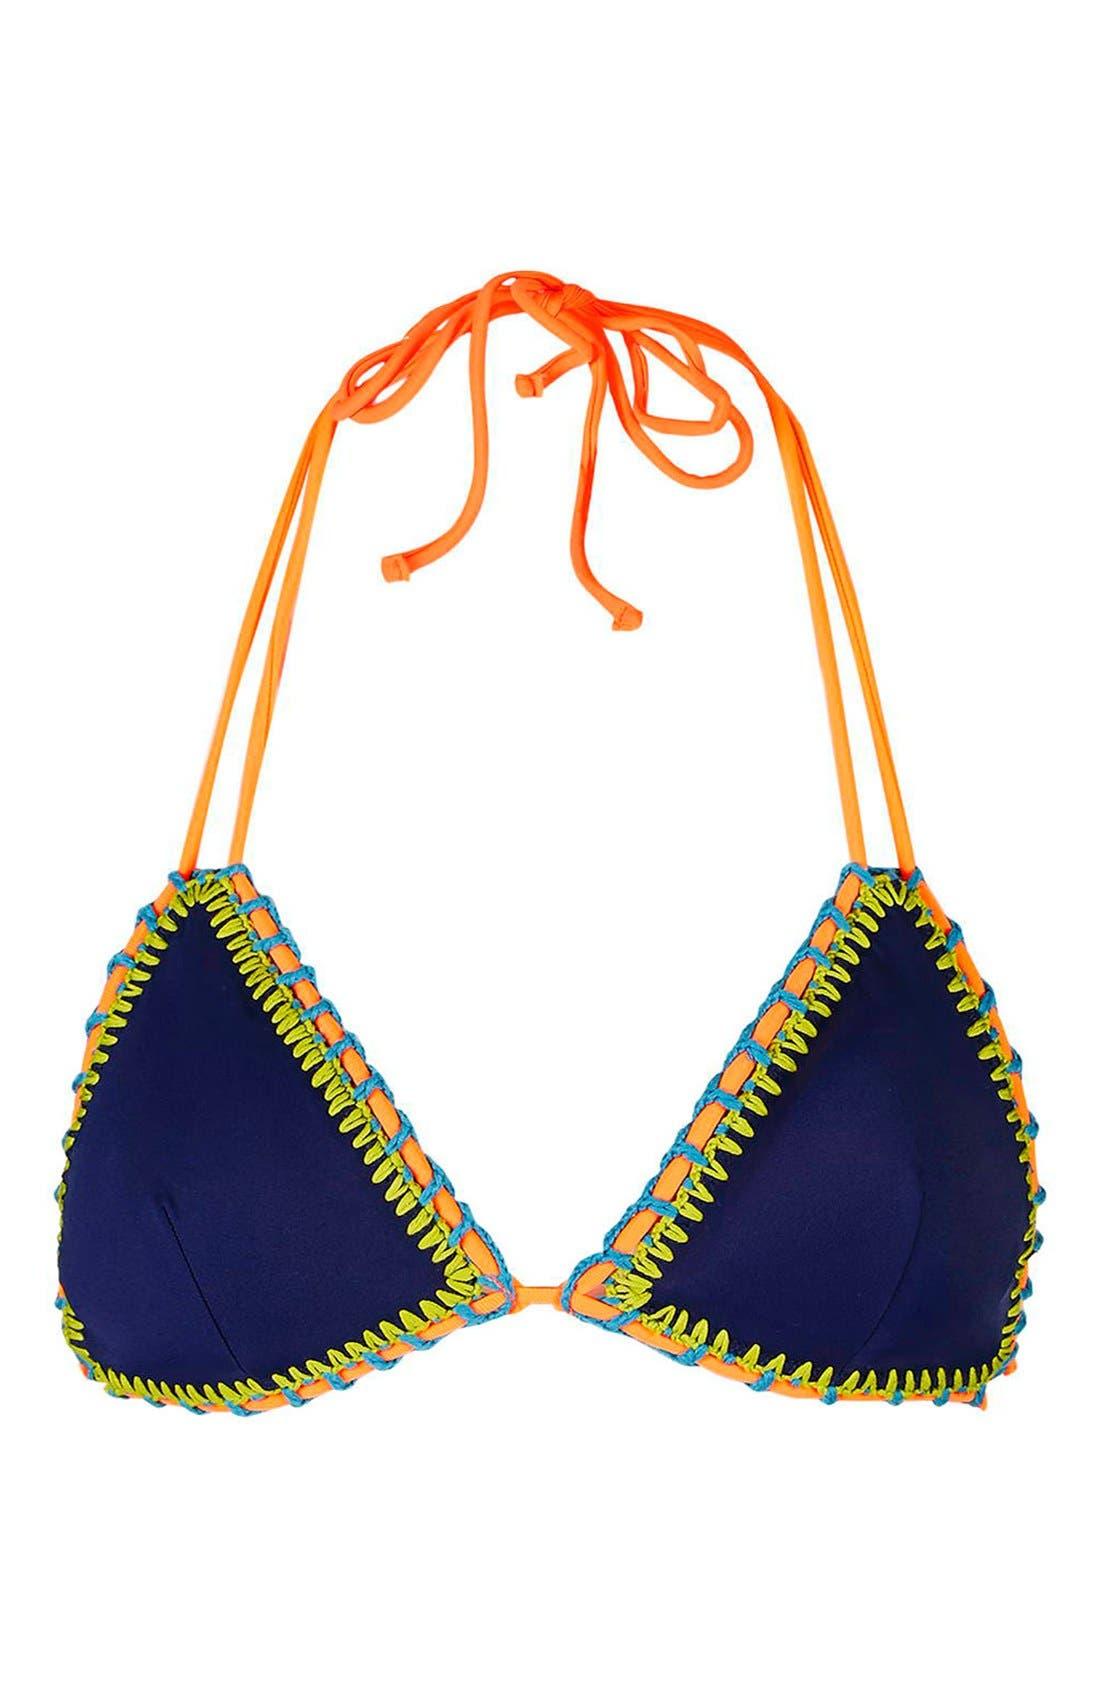 TOPSHOP Crochet Trim Triangle Bikini Top, Main, color, 400